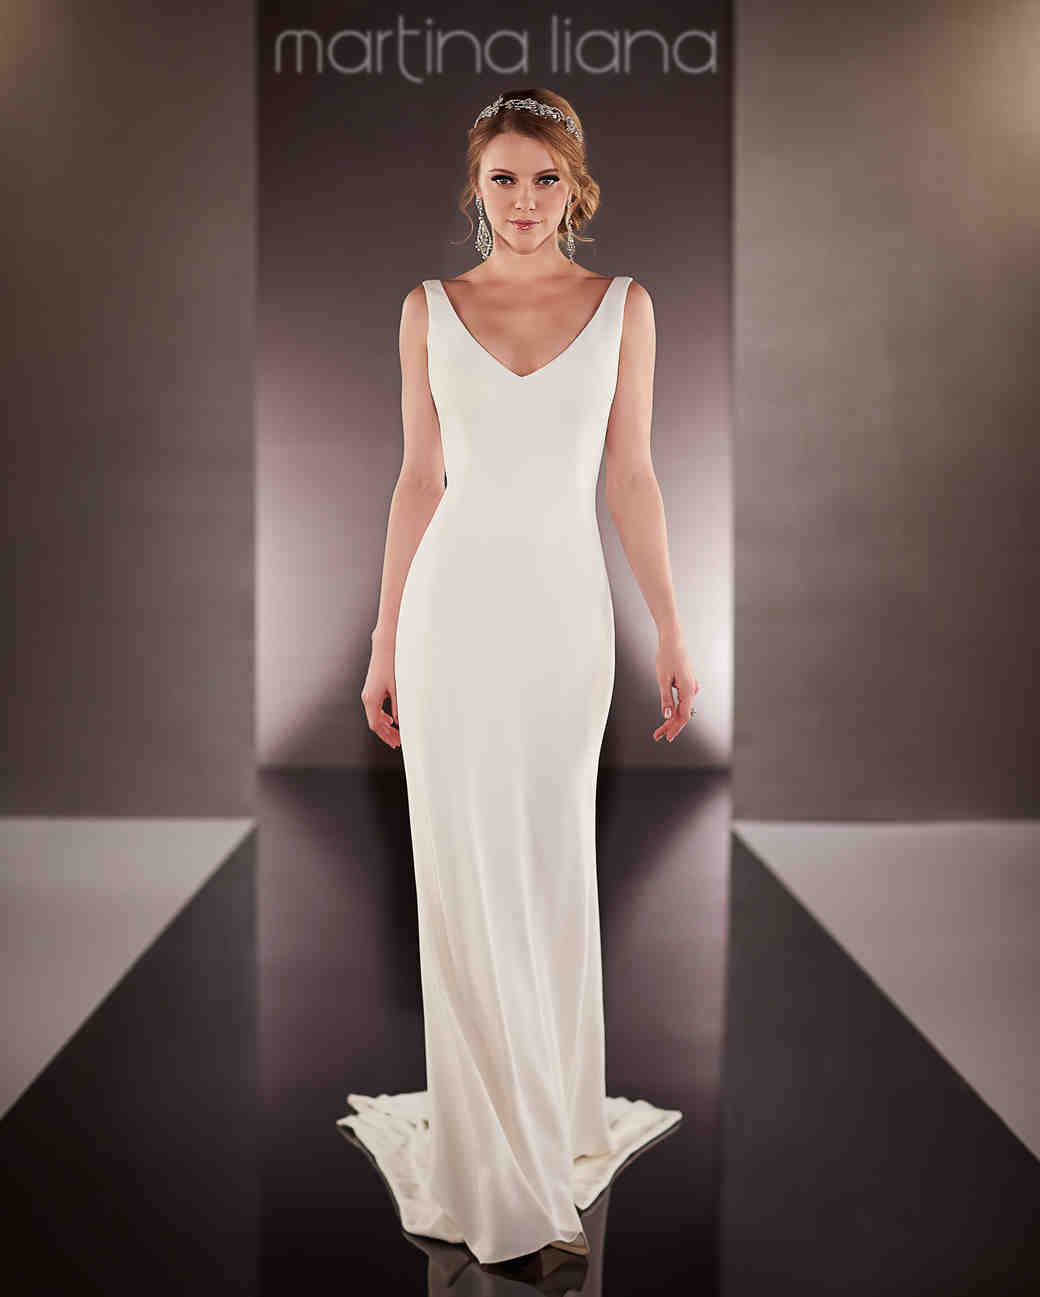 50-states-wedding-dresses-missouri-martina-liana-0615.jpg